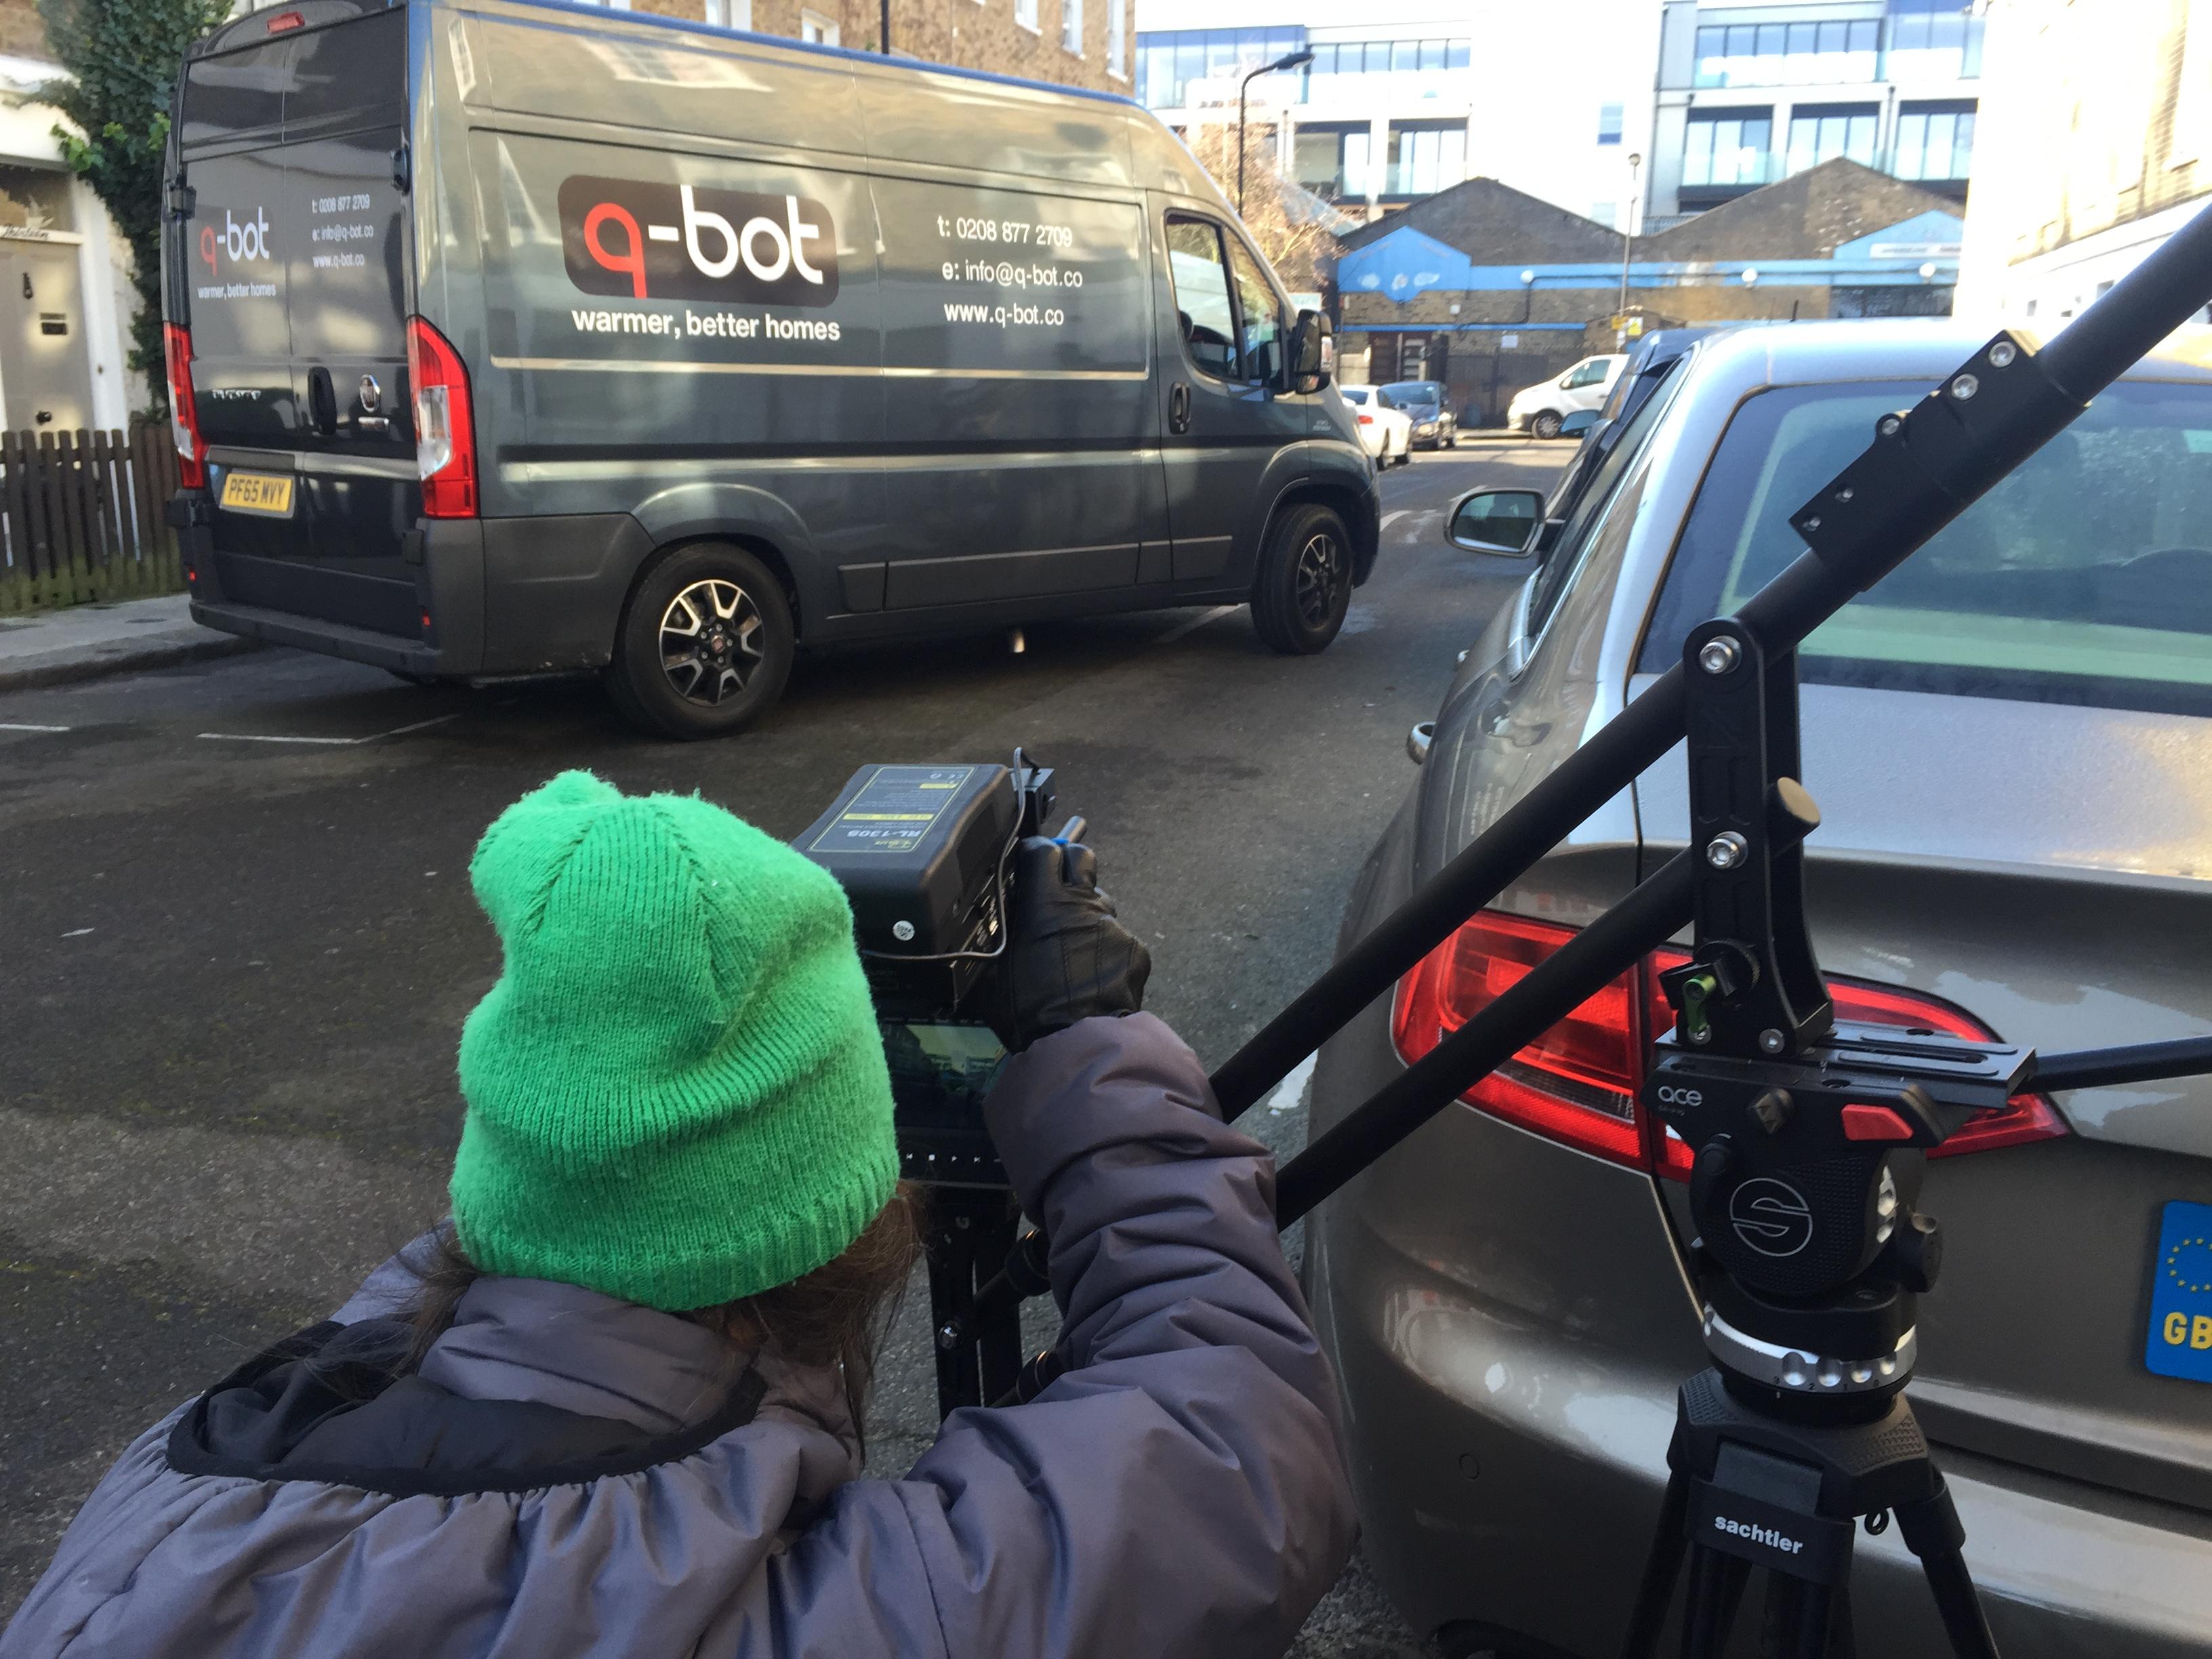 DoP tania is filming Q-bot for DECC film series